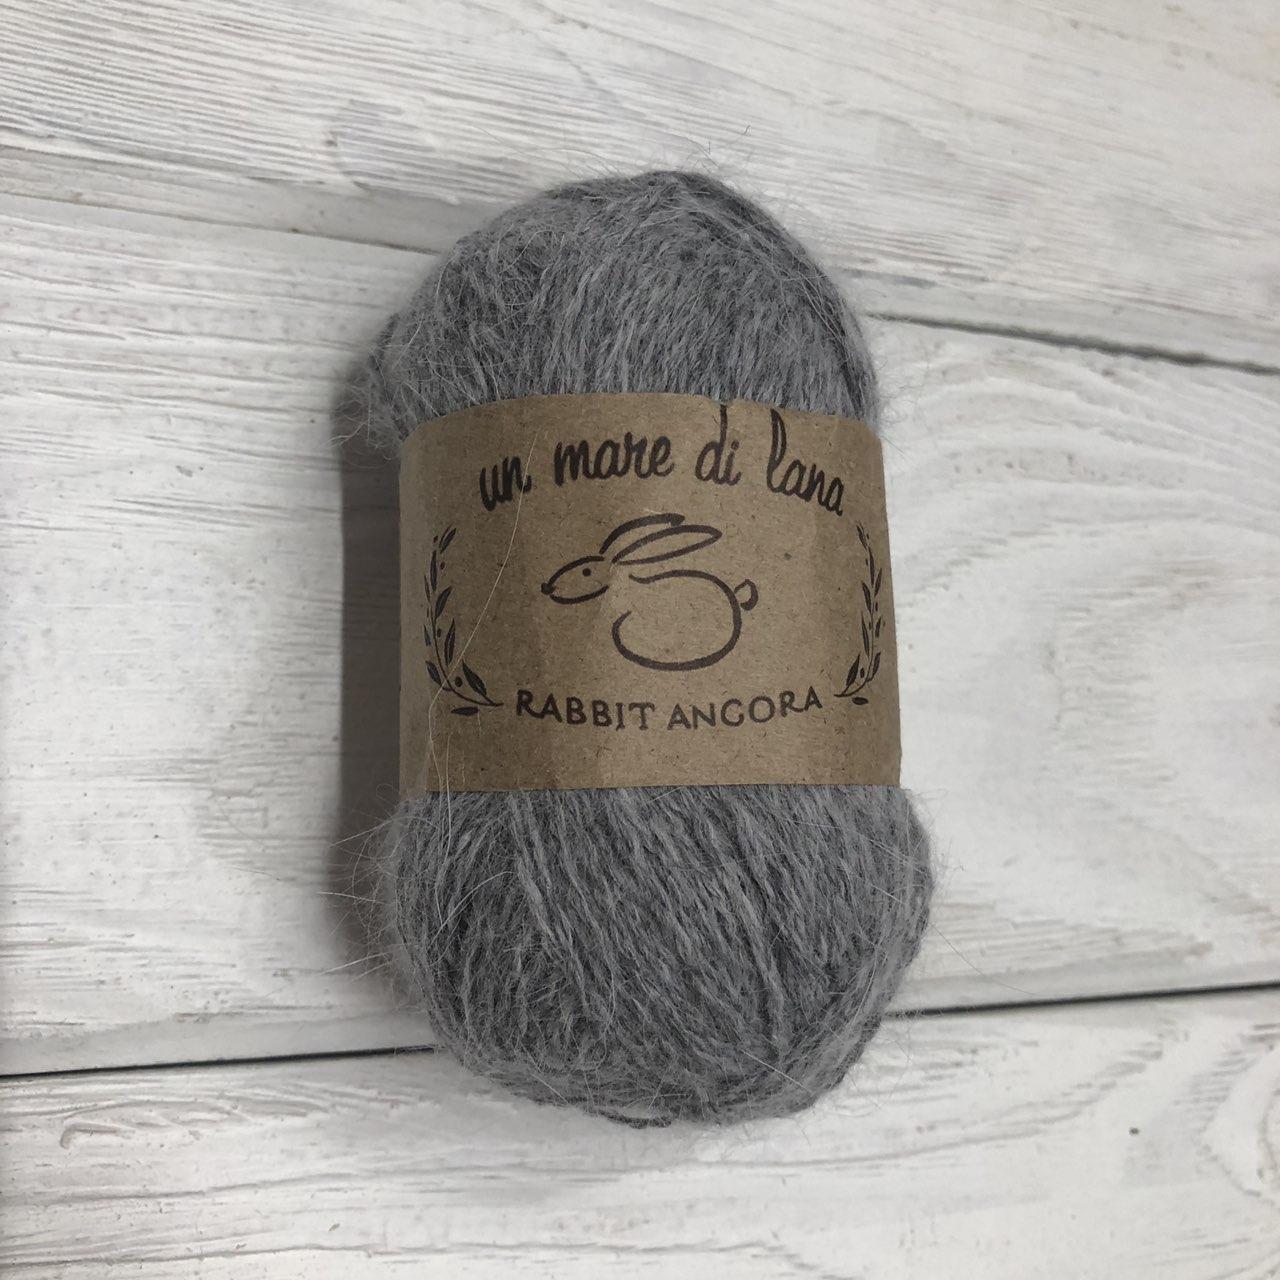 Wool Sea Rabbit Angora (вул сеа Ангора Кролик) 08 - серый меланж заказать в Минске